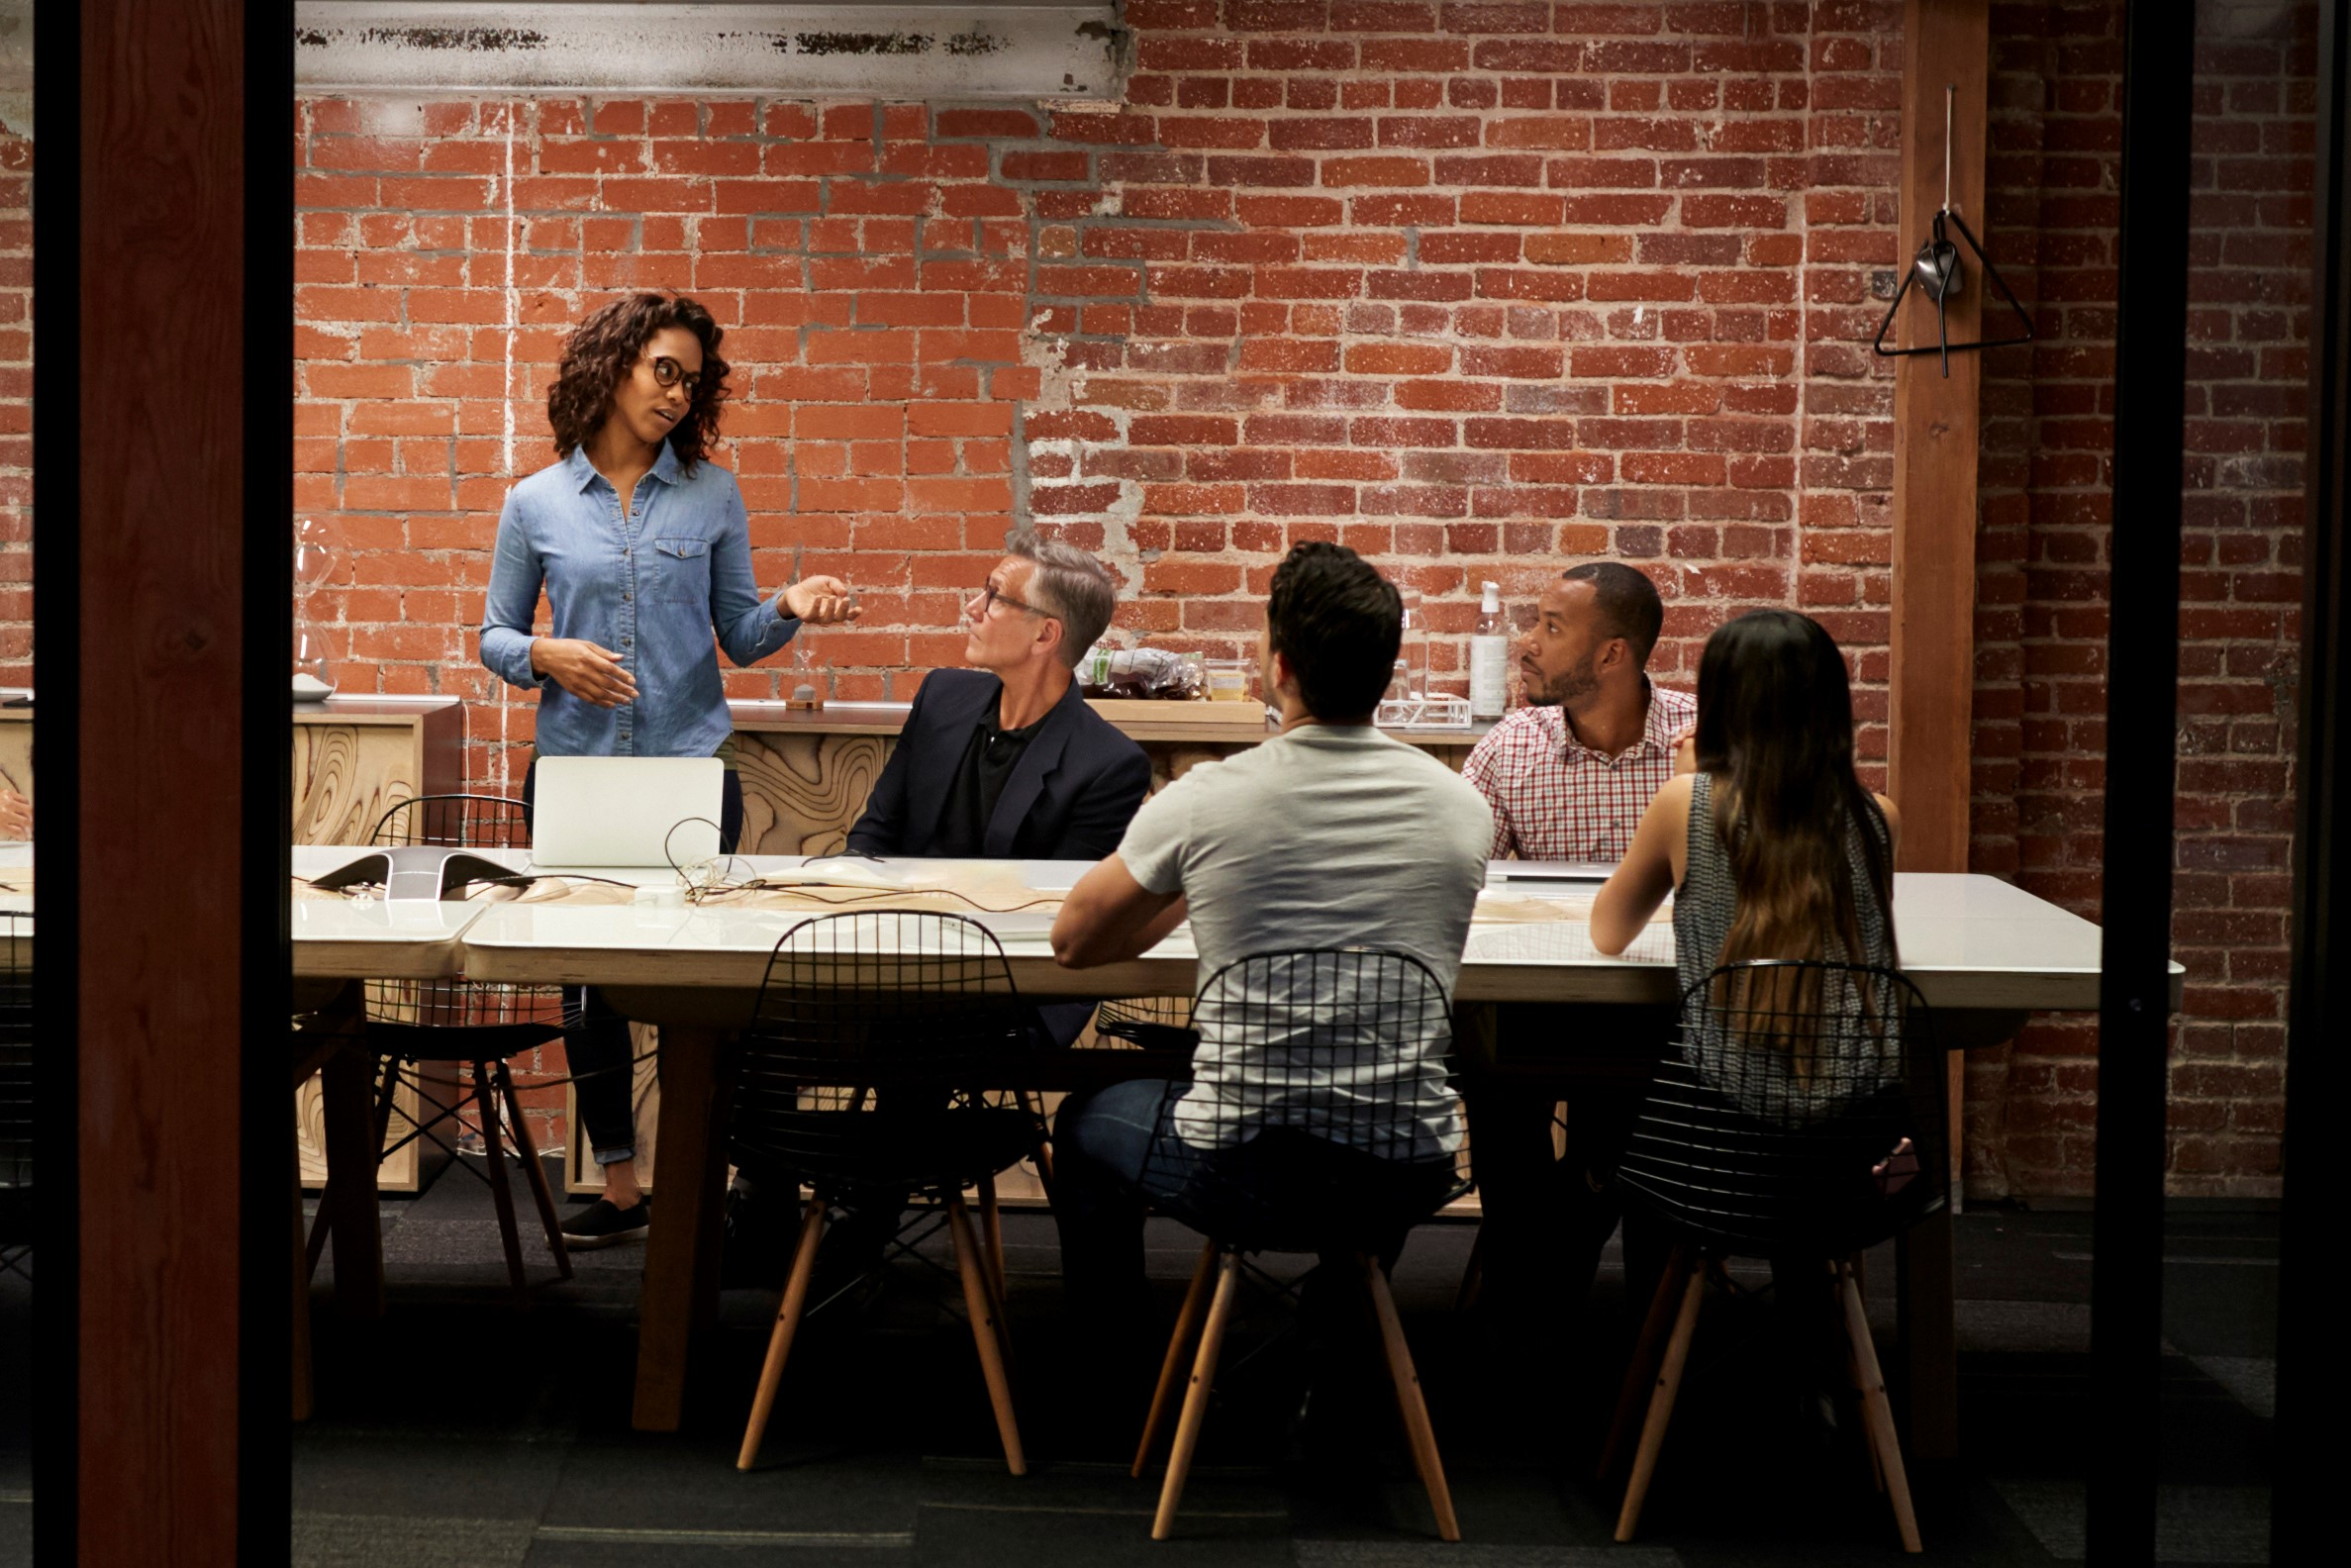 Canva - Business Team Having Late Night Meeting Sitting around Boardroom